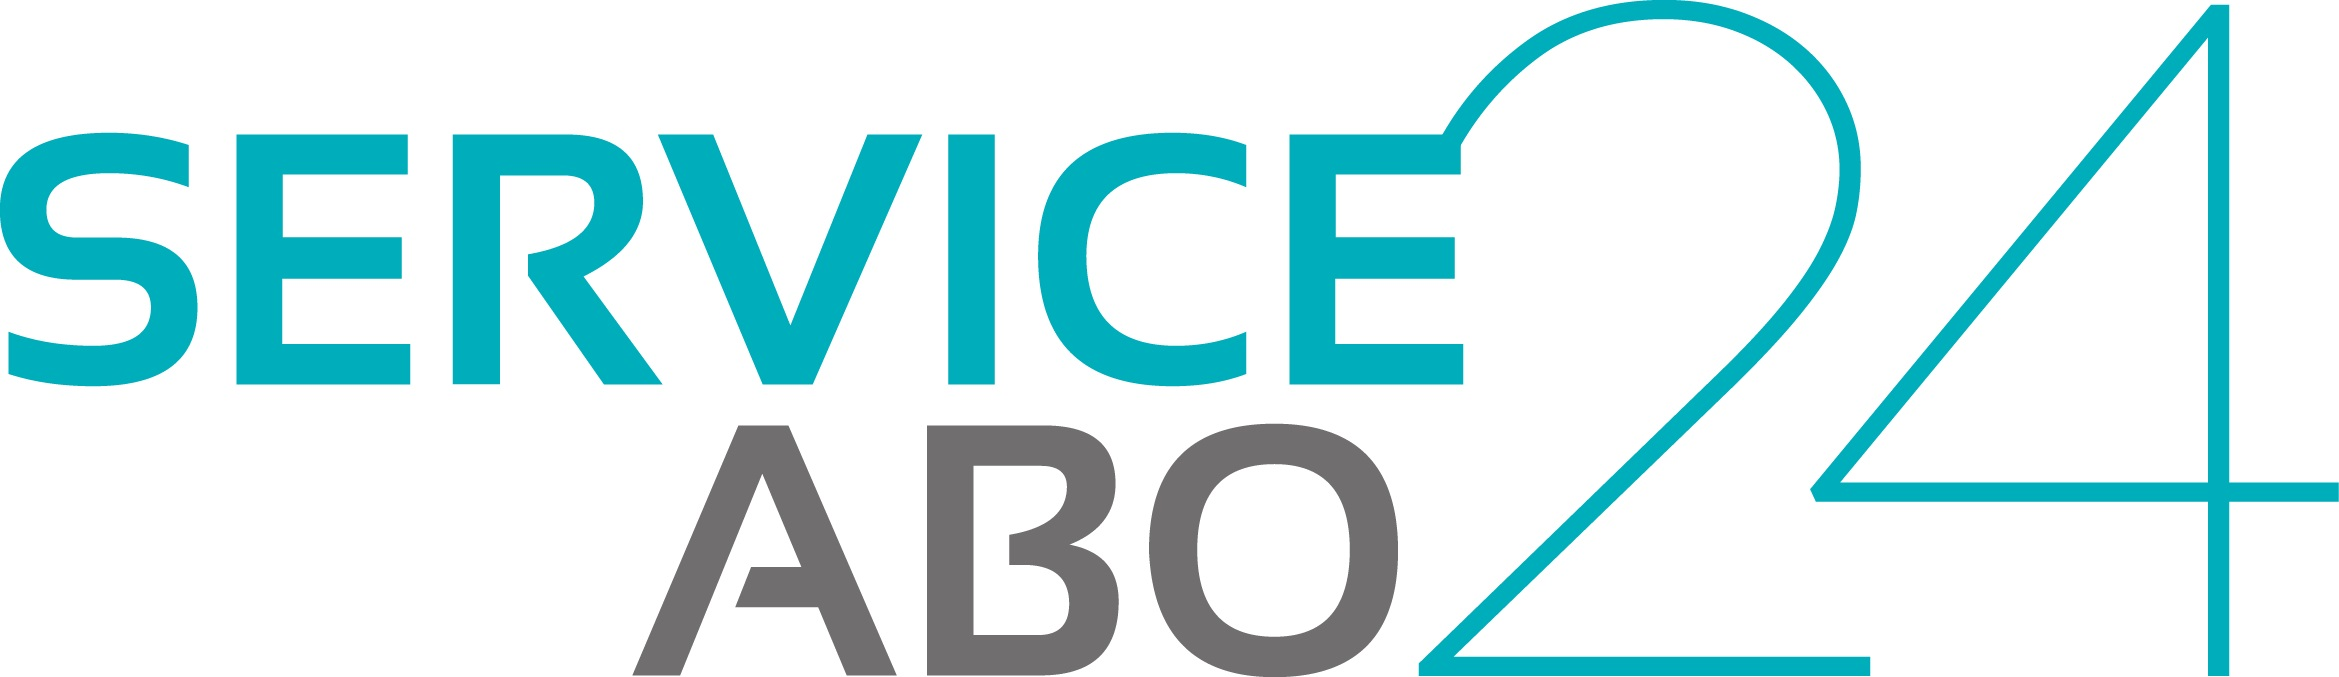 ServiceAbo 24